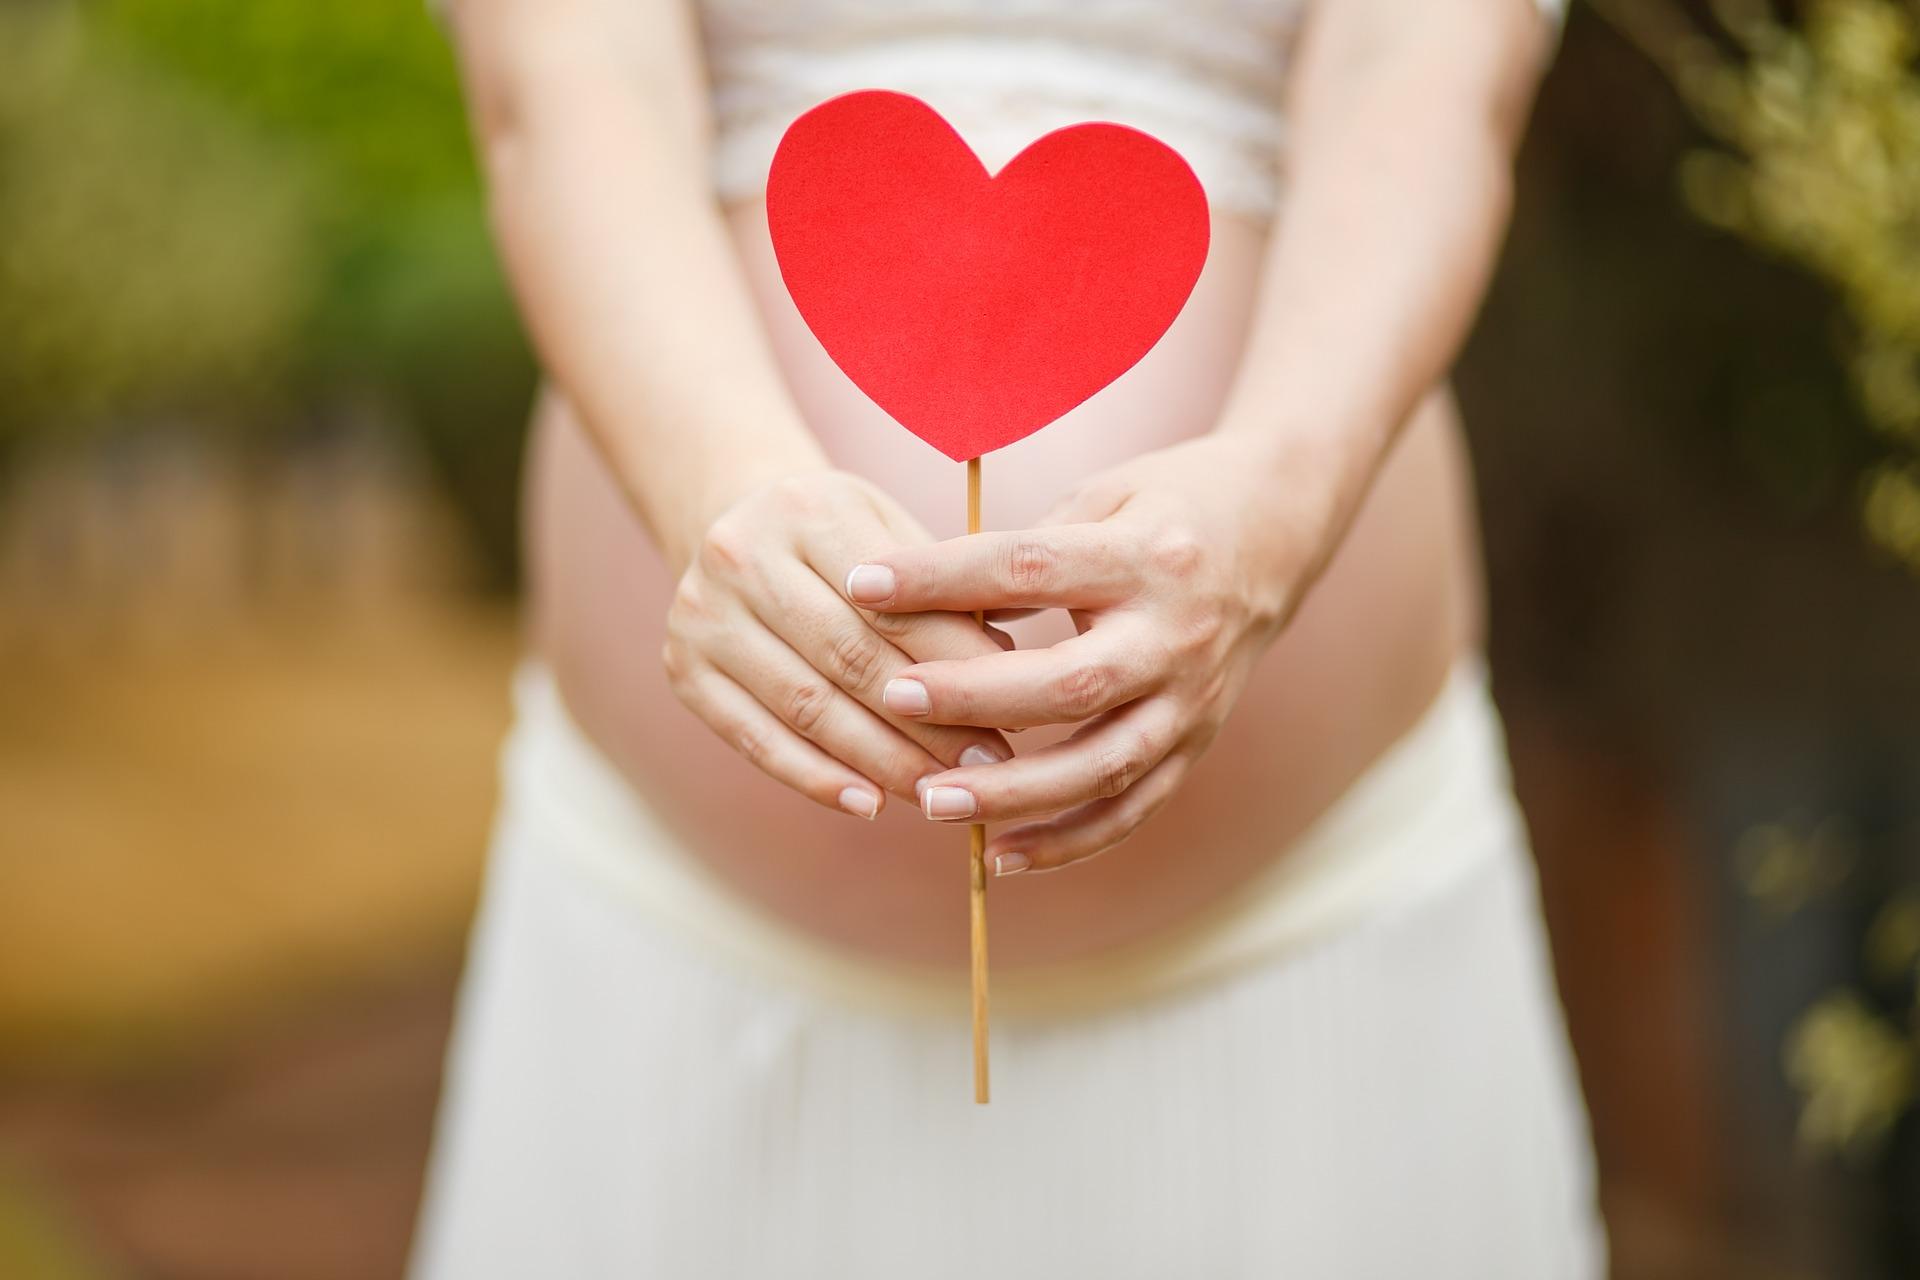 Пол ребёнка по дате зачатия и обновления крови онлайн